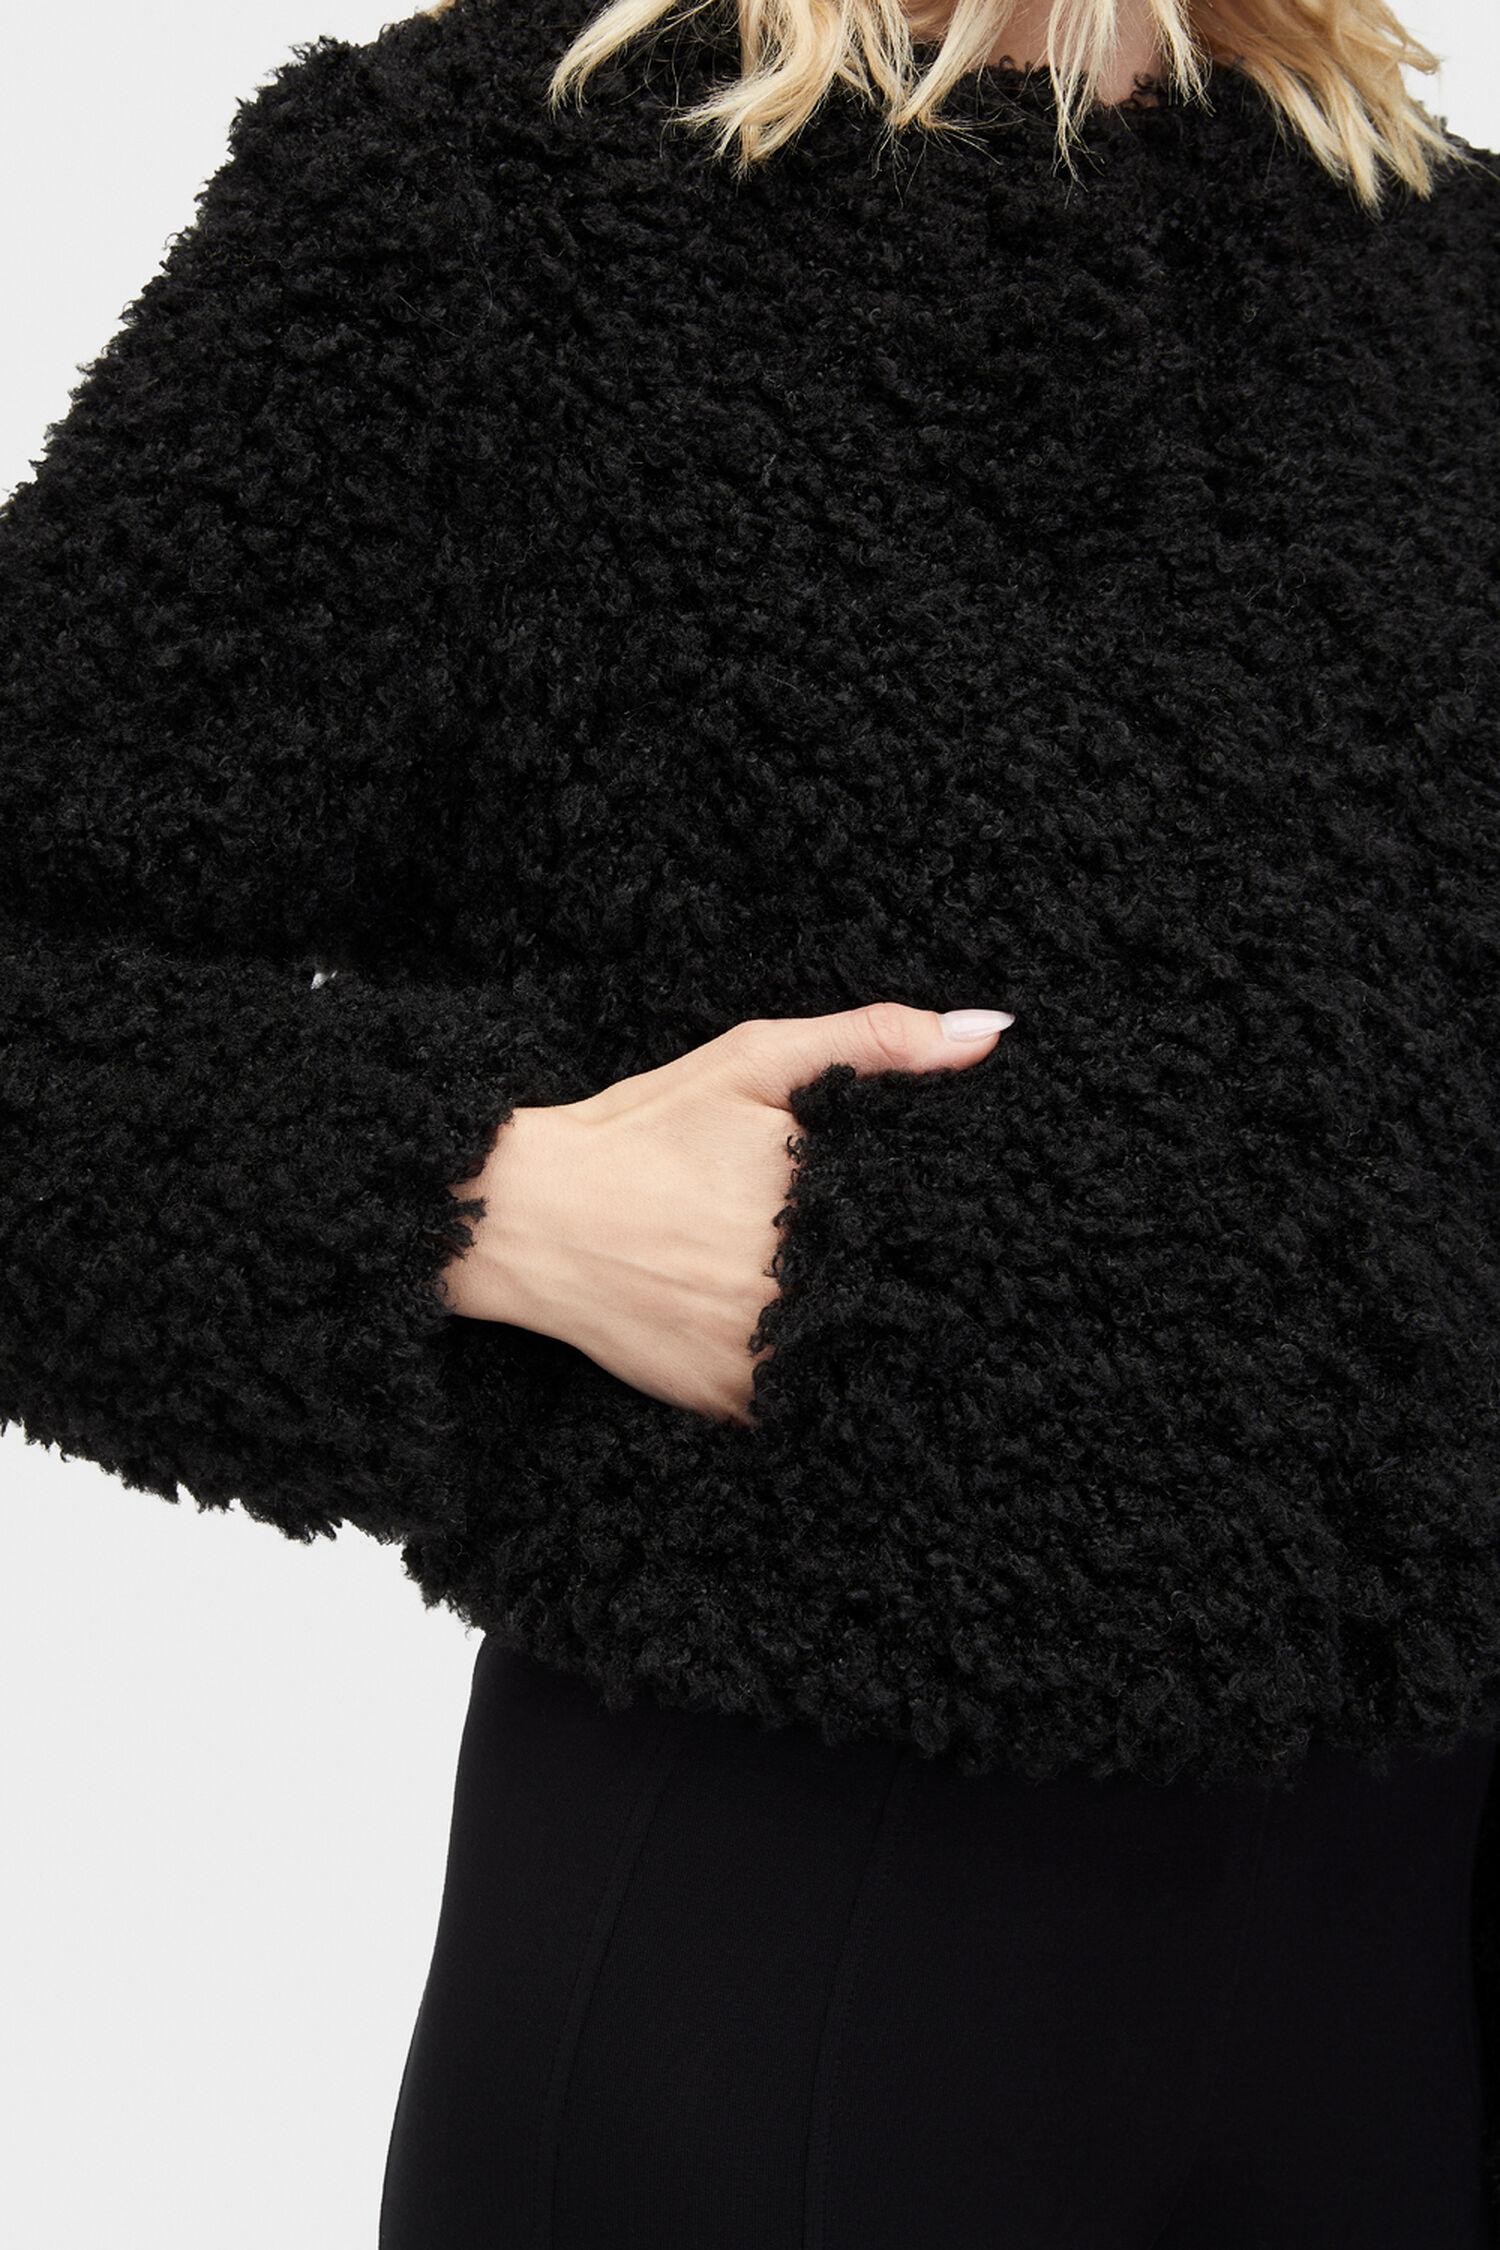 971c2038e48b Zoom Lorrena Faux Fur Jacket - Image 5 of 5